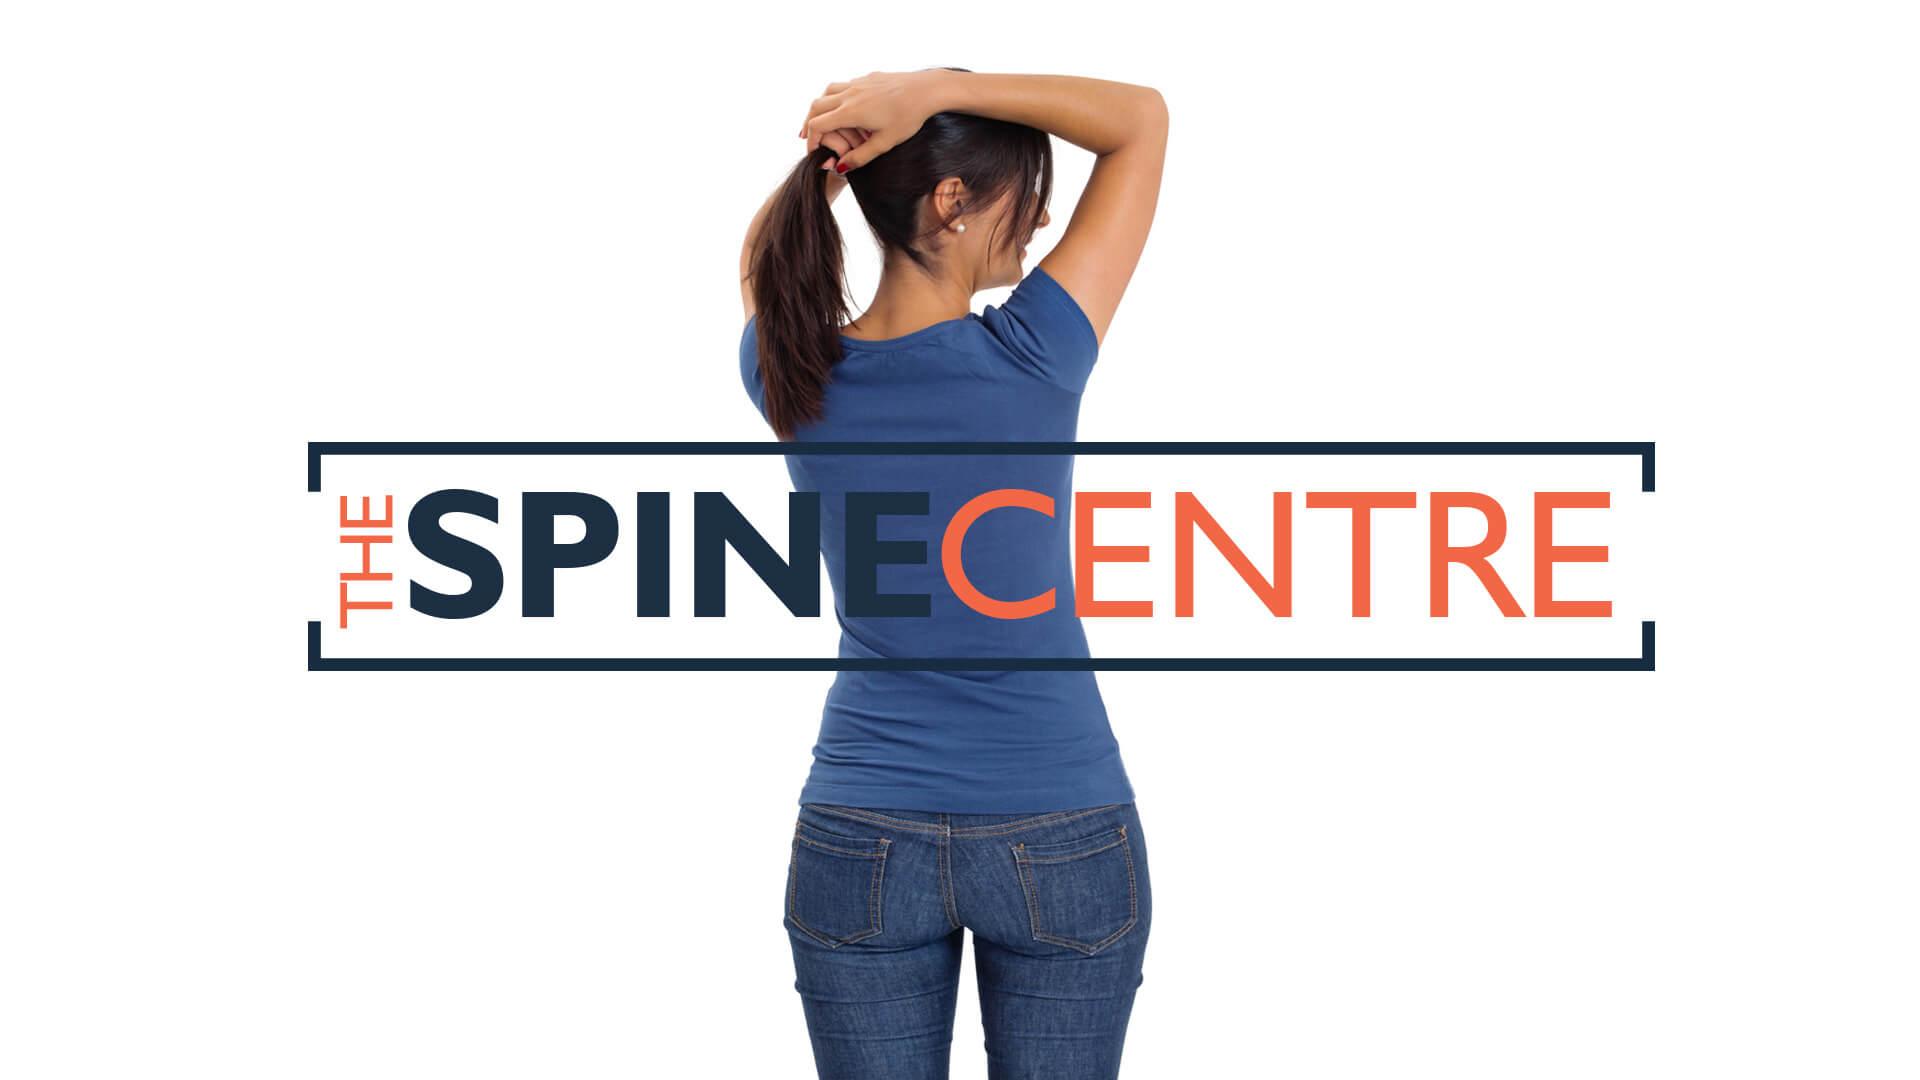 Spine Centre Chiropractic Slider Image 3